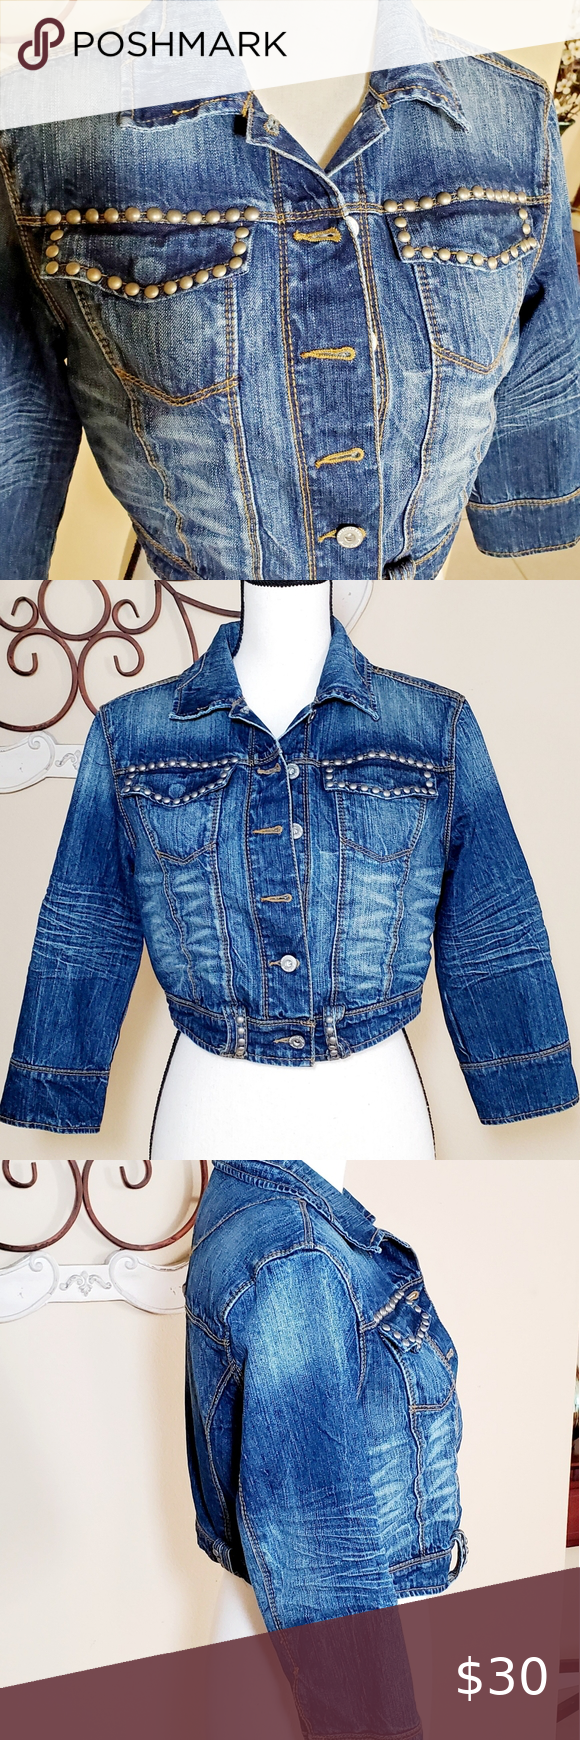 American Rag Cie Cropped Studded Jean Jacket Denim Jacket With Hoodie Studded Jeans Sleeveless Denim Jackets [ 1740 x 580 Pixel ]